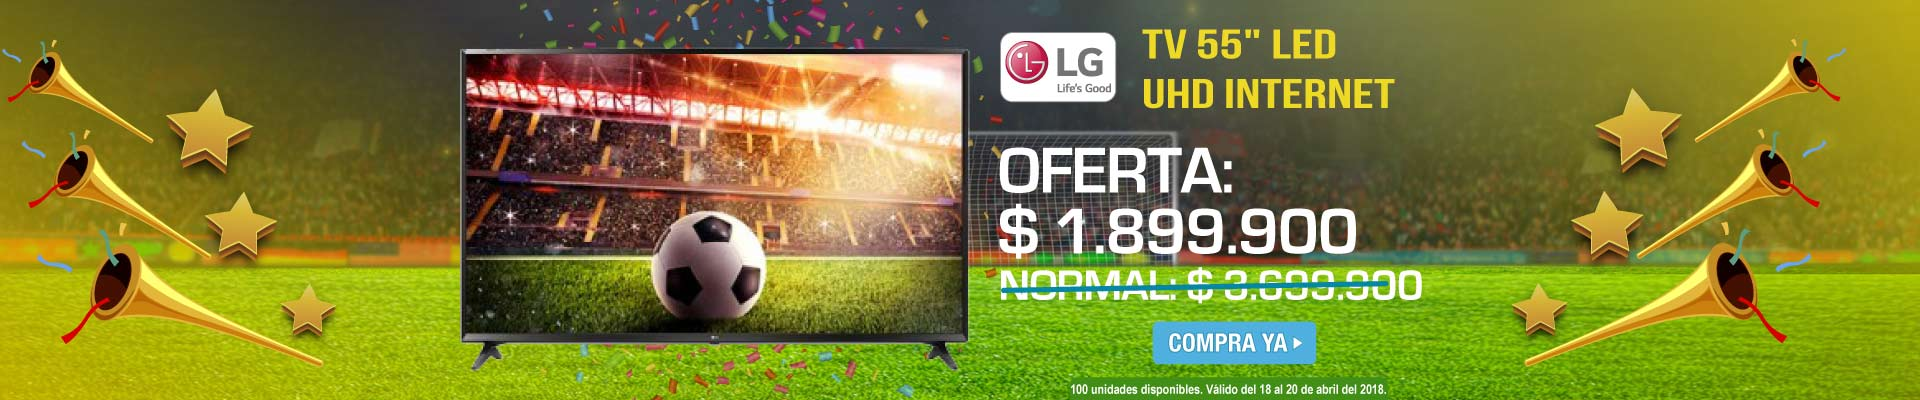 PPAL ALKP-3-TV-Tv 55 139cm LG LED 55UJ635 UHD Internet-prod-Abril18-20